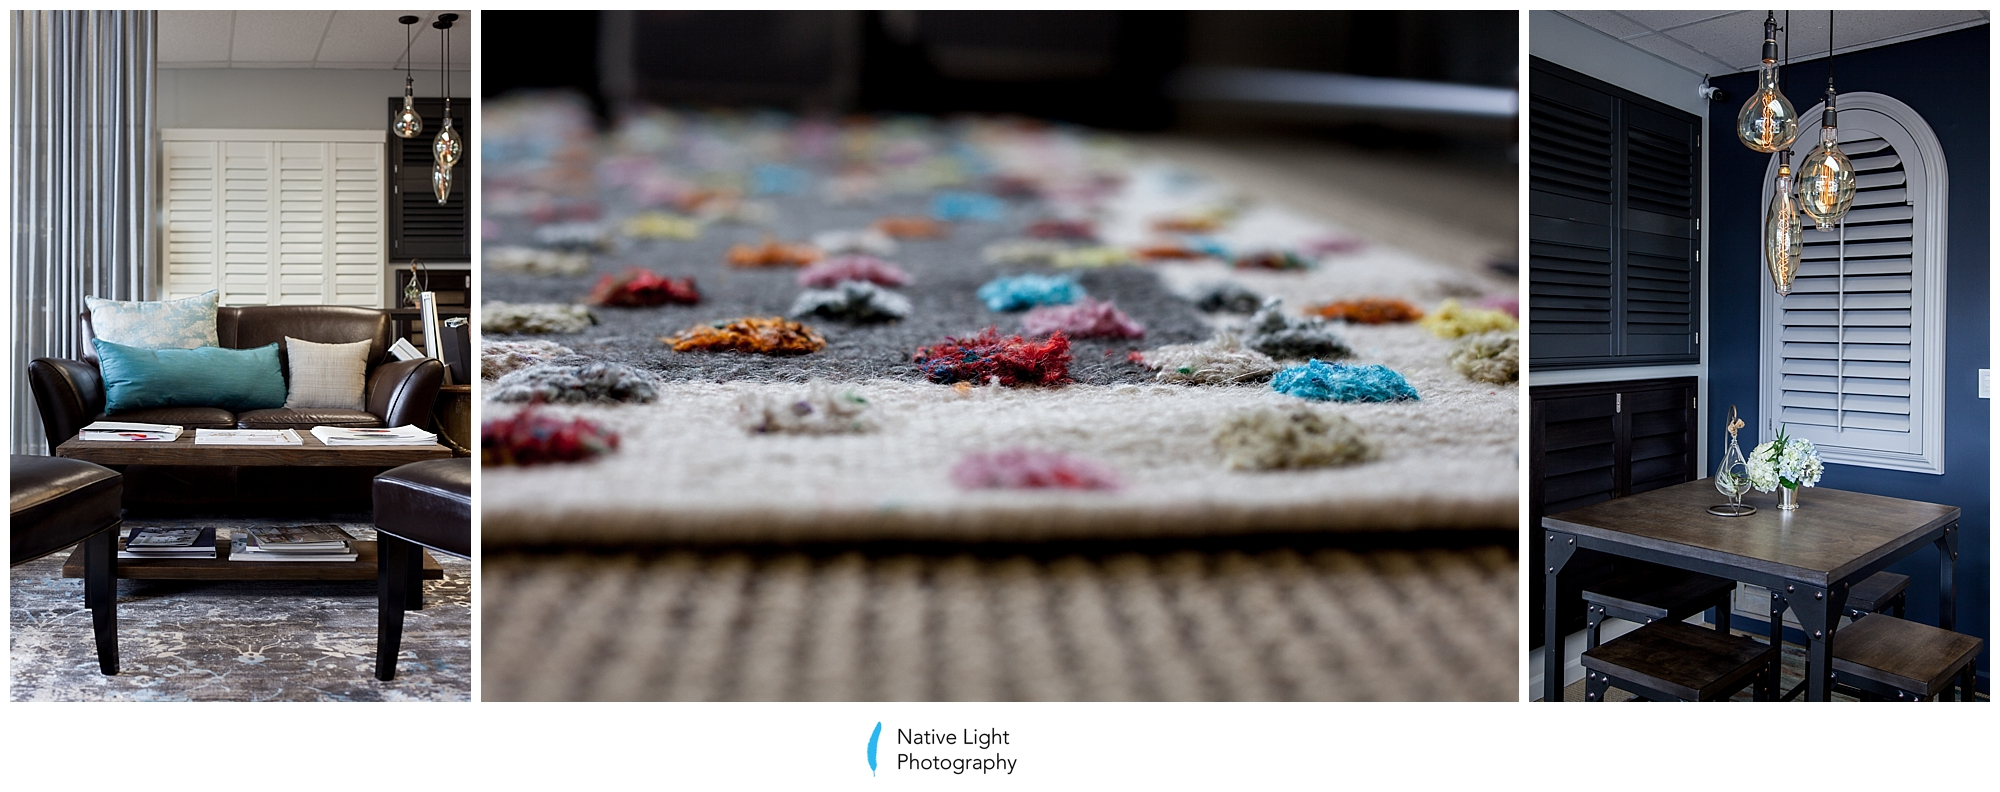 Native Light Photography